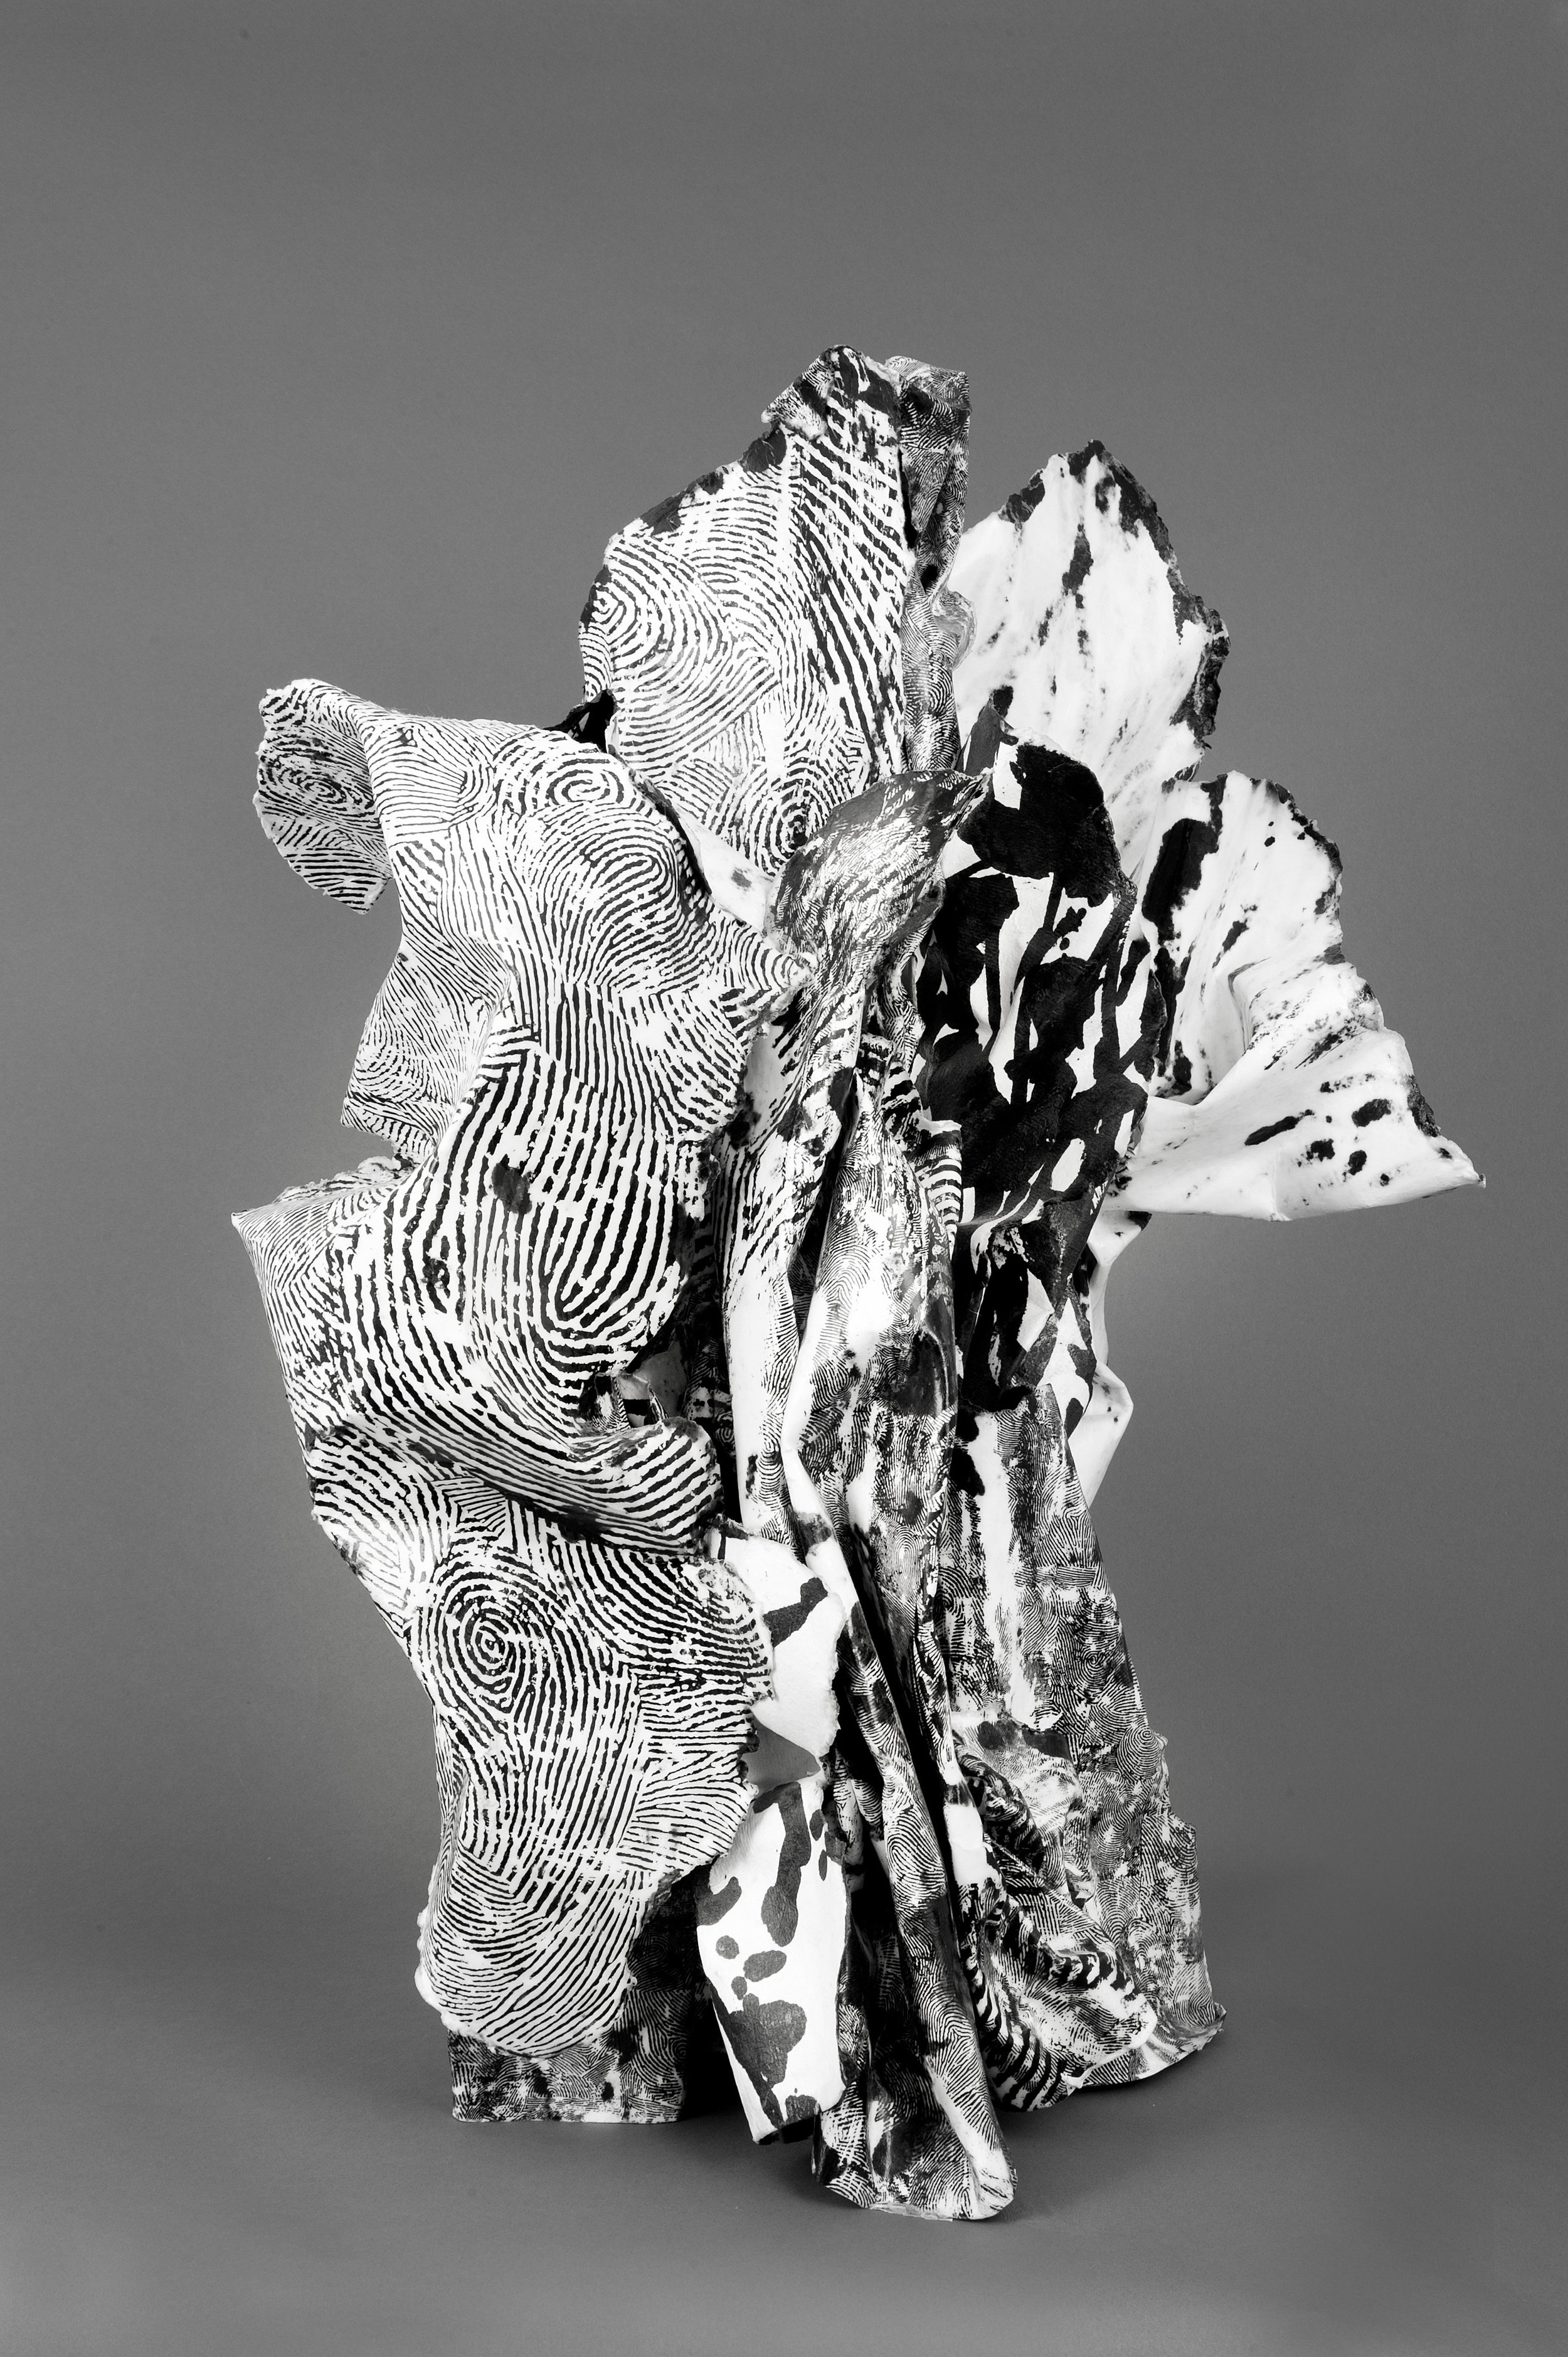 Hilda Shen,  Rock Strata , 2003. Paper, ink, wax, wood, 14 x 18 x 25 inches ©Hilda Shen, courtesy of Fou Gallery